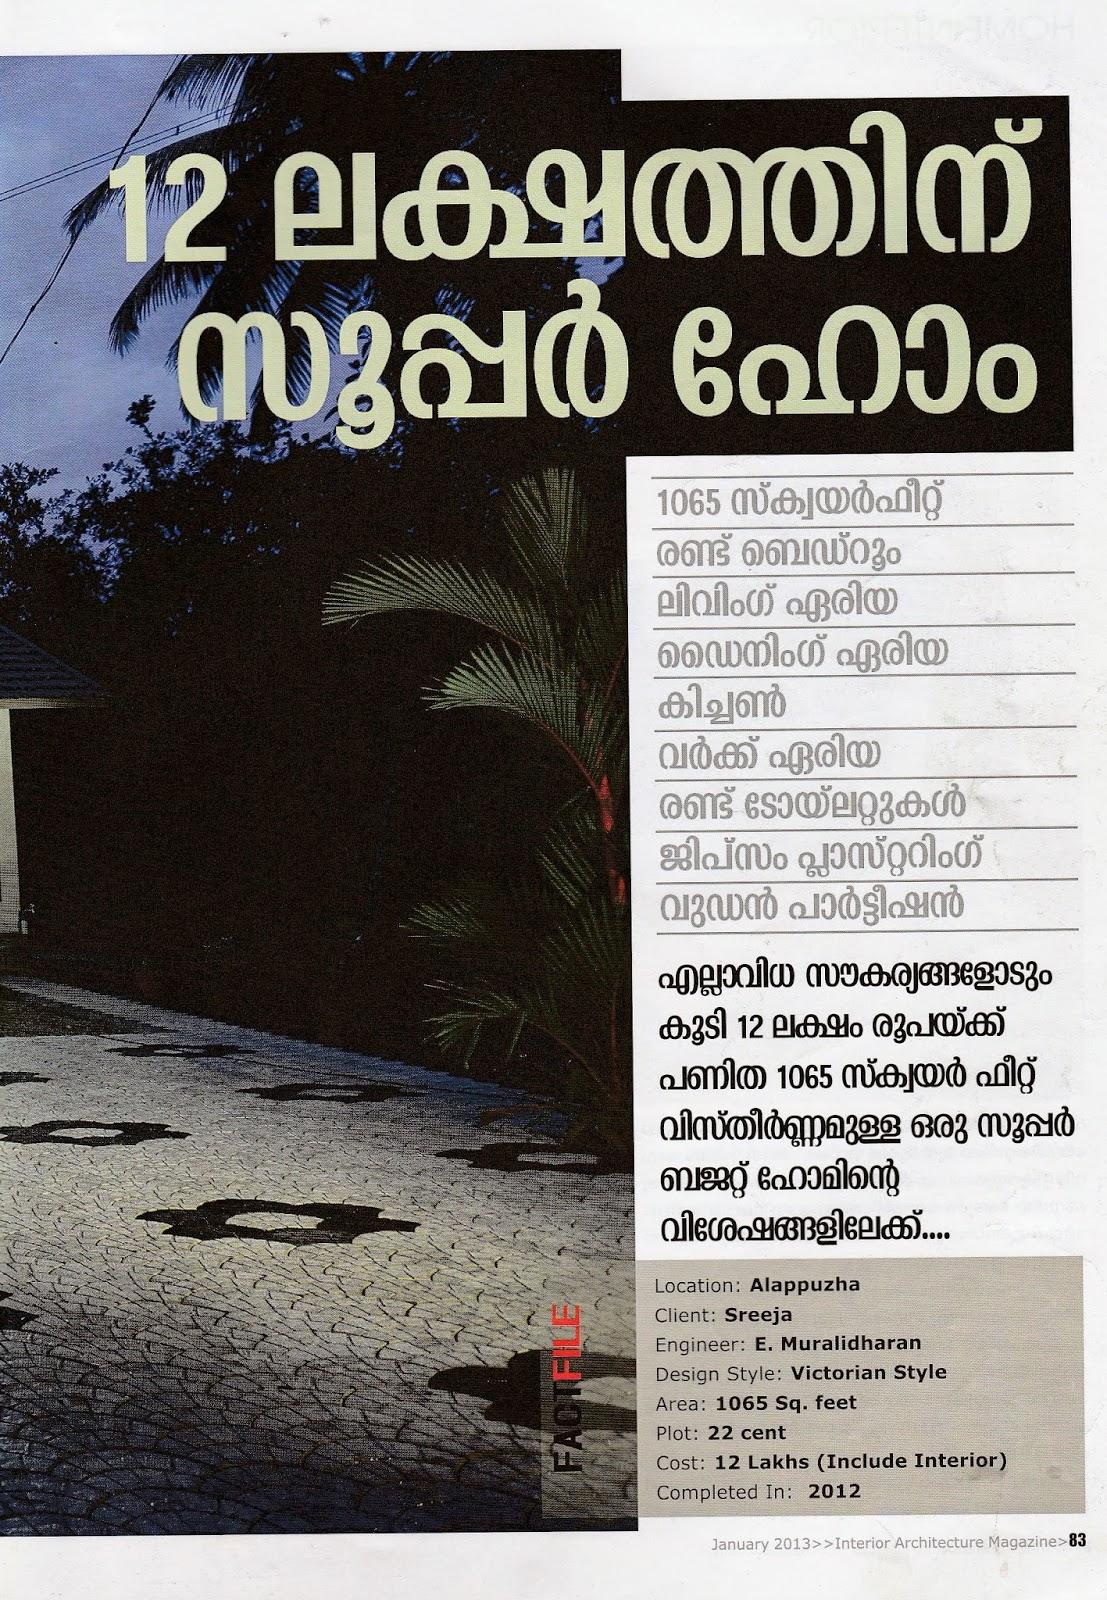 INTERIOR MAGAZINE JANUARY 2013